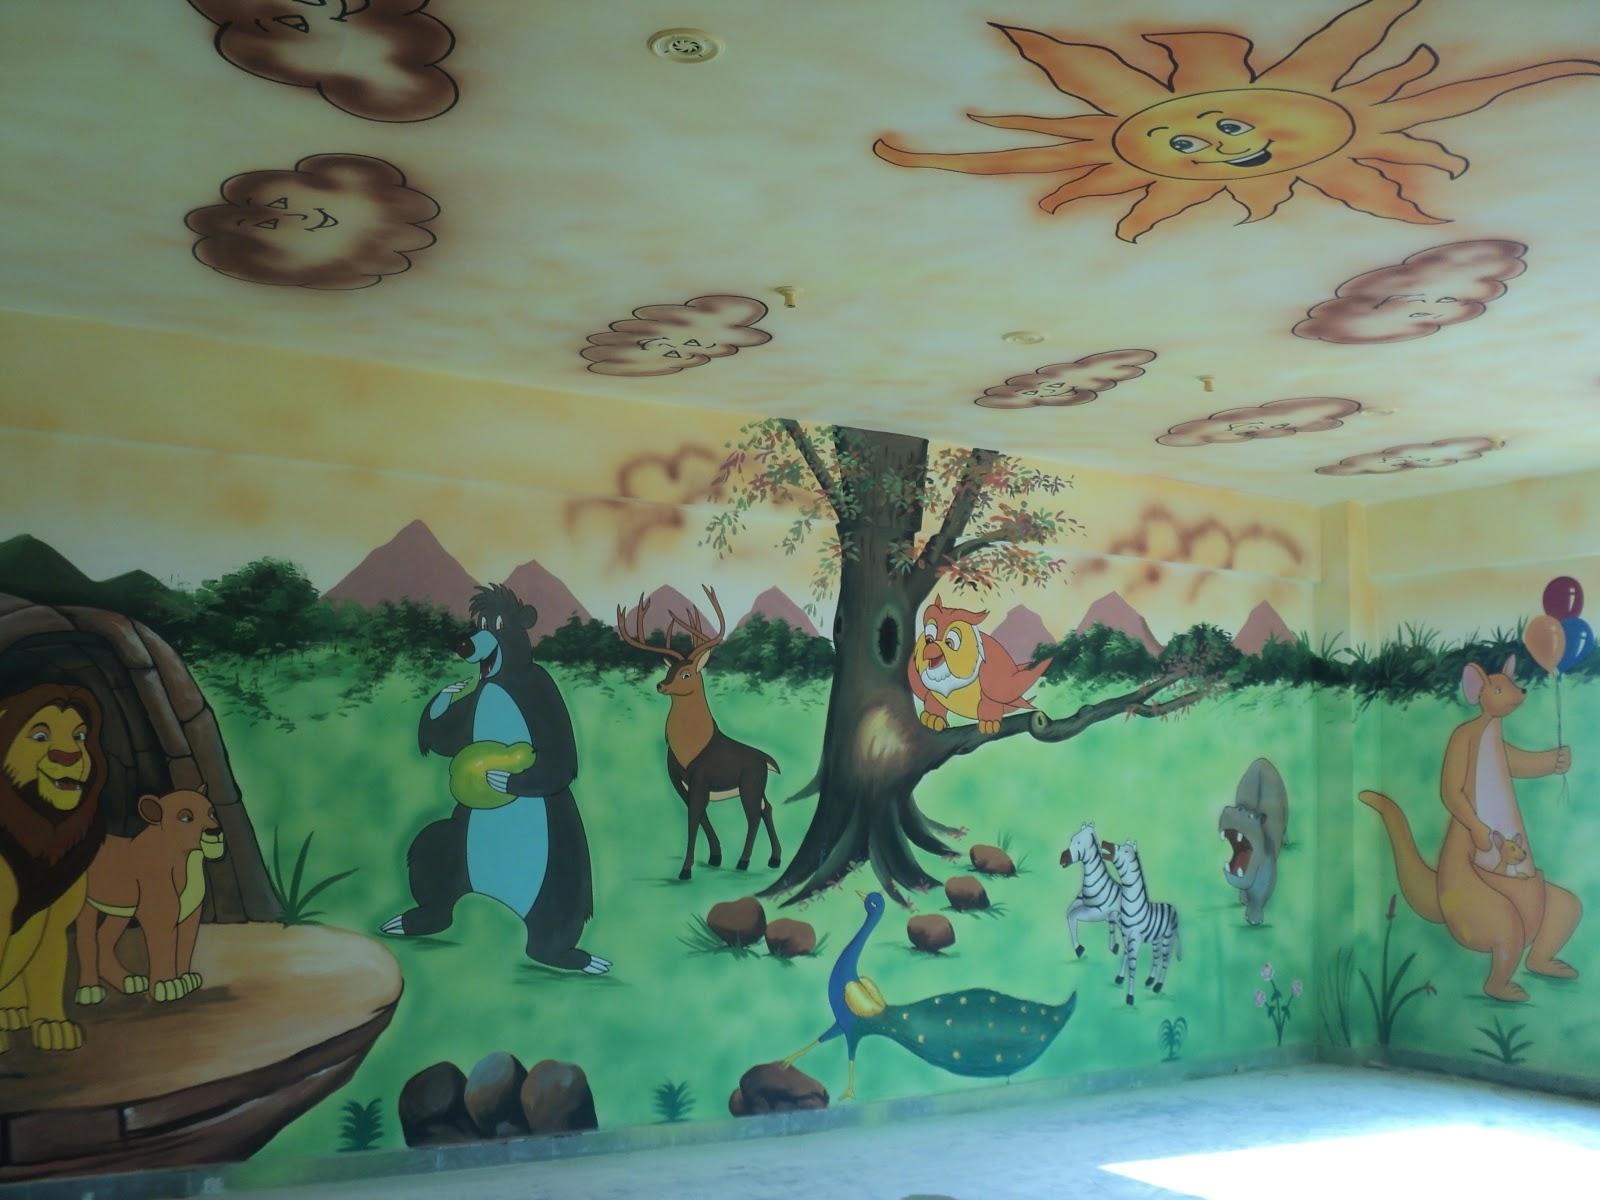 Play School Wall Painting 3d Cartoon Painting School Painting